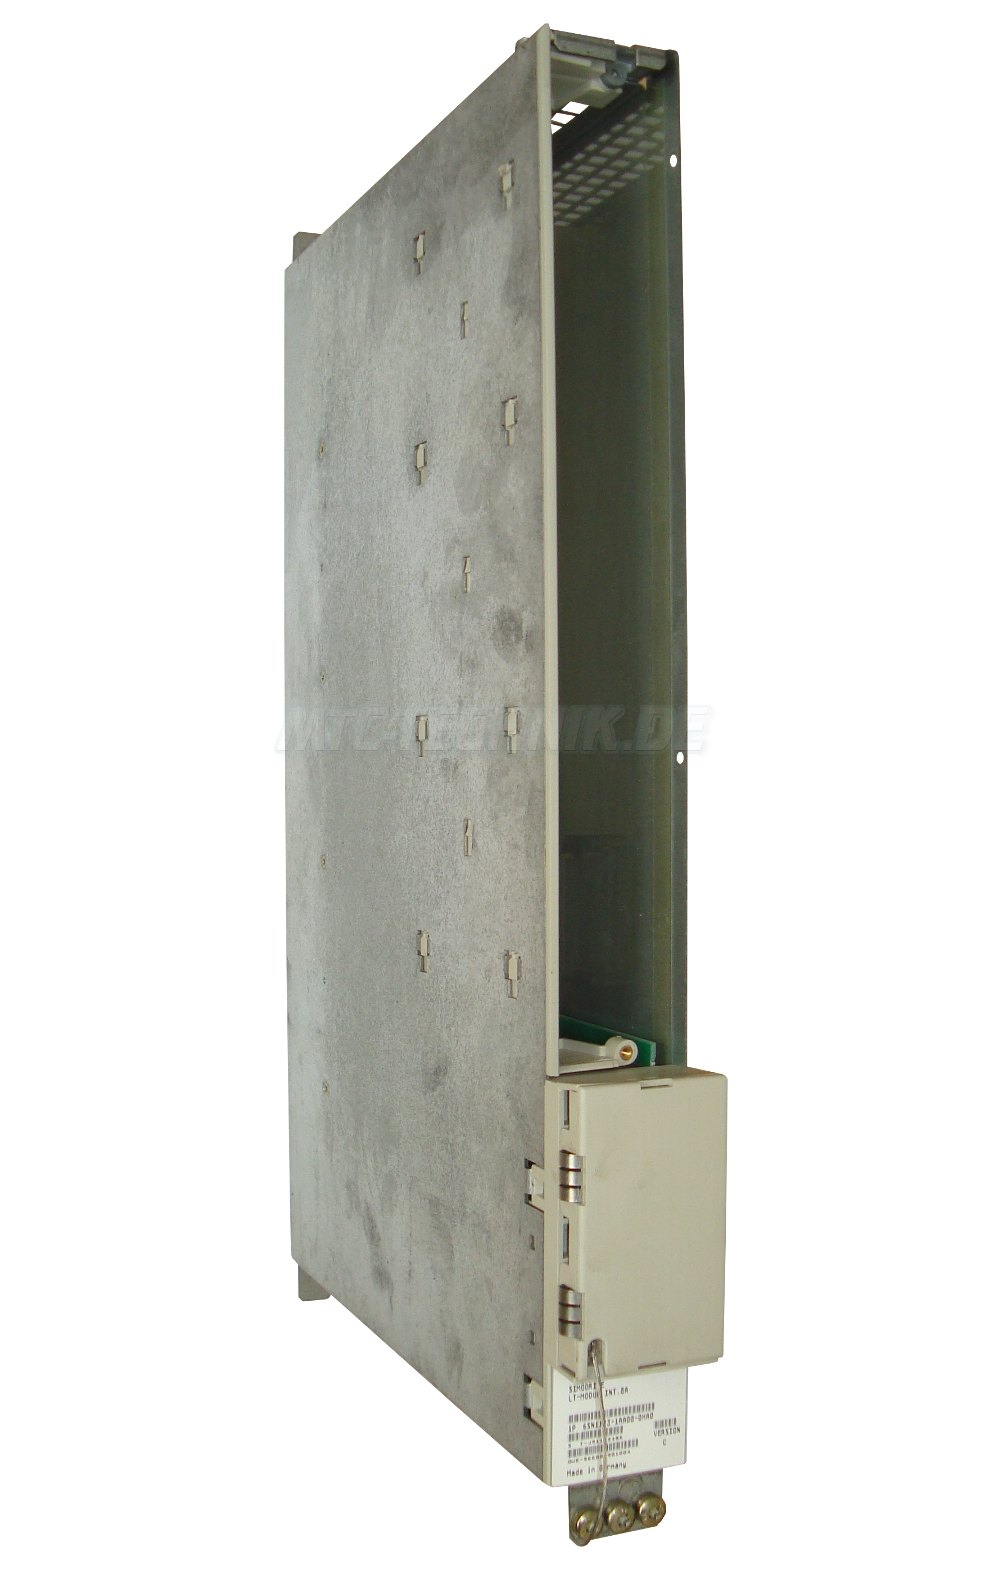 frequenzumformer 6sn1123 1aa00 0ha0 siemens simodrive lt. Black Bedroom Furniture Sets. Home Design Ideas